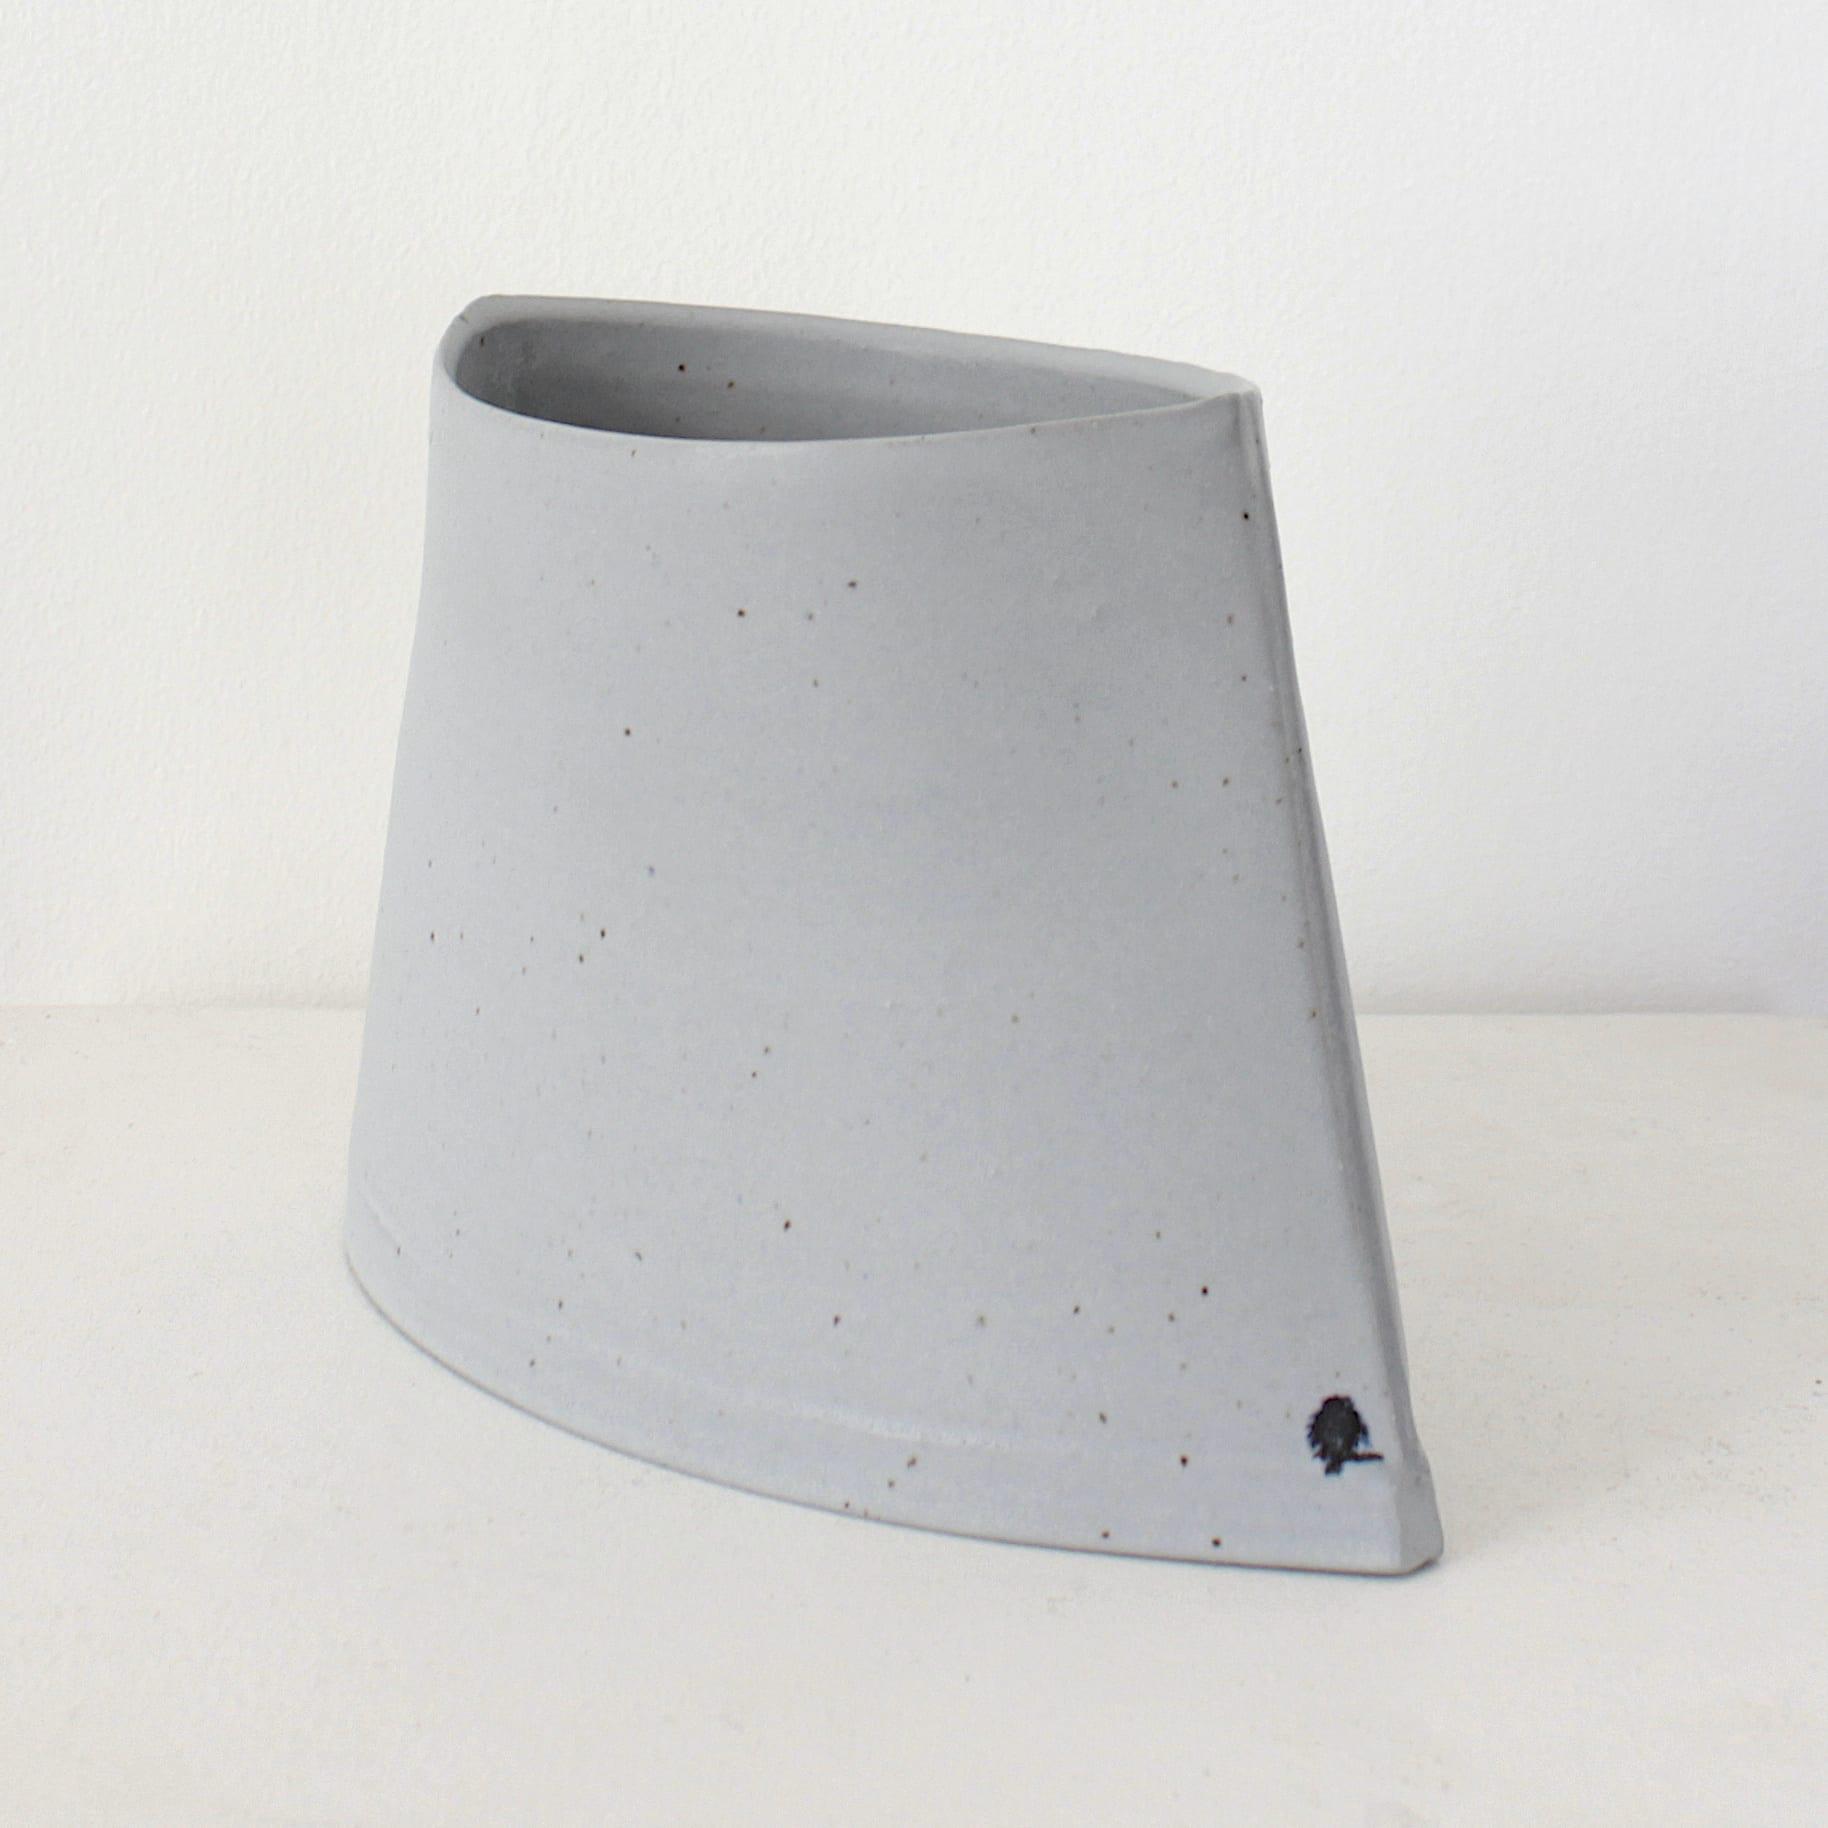 "<span class=""link fancybox-details-link""><a href=""/artists/99-carina-ciscato/works/7882-carina-ciscato-small-coloured-porcelain-pocket-pot-2021/"">View Detail Page</a></span><div class=""artist""><strong>Carina Ciscato</strong></div> <div class=""title""><em>Small Coloured Porcelain Pocket Pot</em>, 2021</div> <div class=""signed_and_dated"">artist stamp</div> <div class=""medium"">porcelain</div> <div class=""dimensions"">12 x 19 x 9 cm</div><div class=""price"">£352.00</div><div class=""copyright_line"">Own Art: £35.20 x 10 Months, 0% APR</div>"